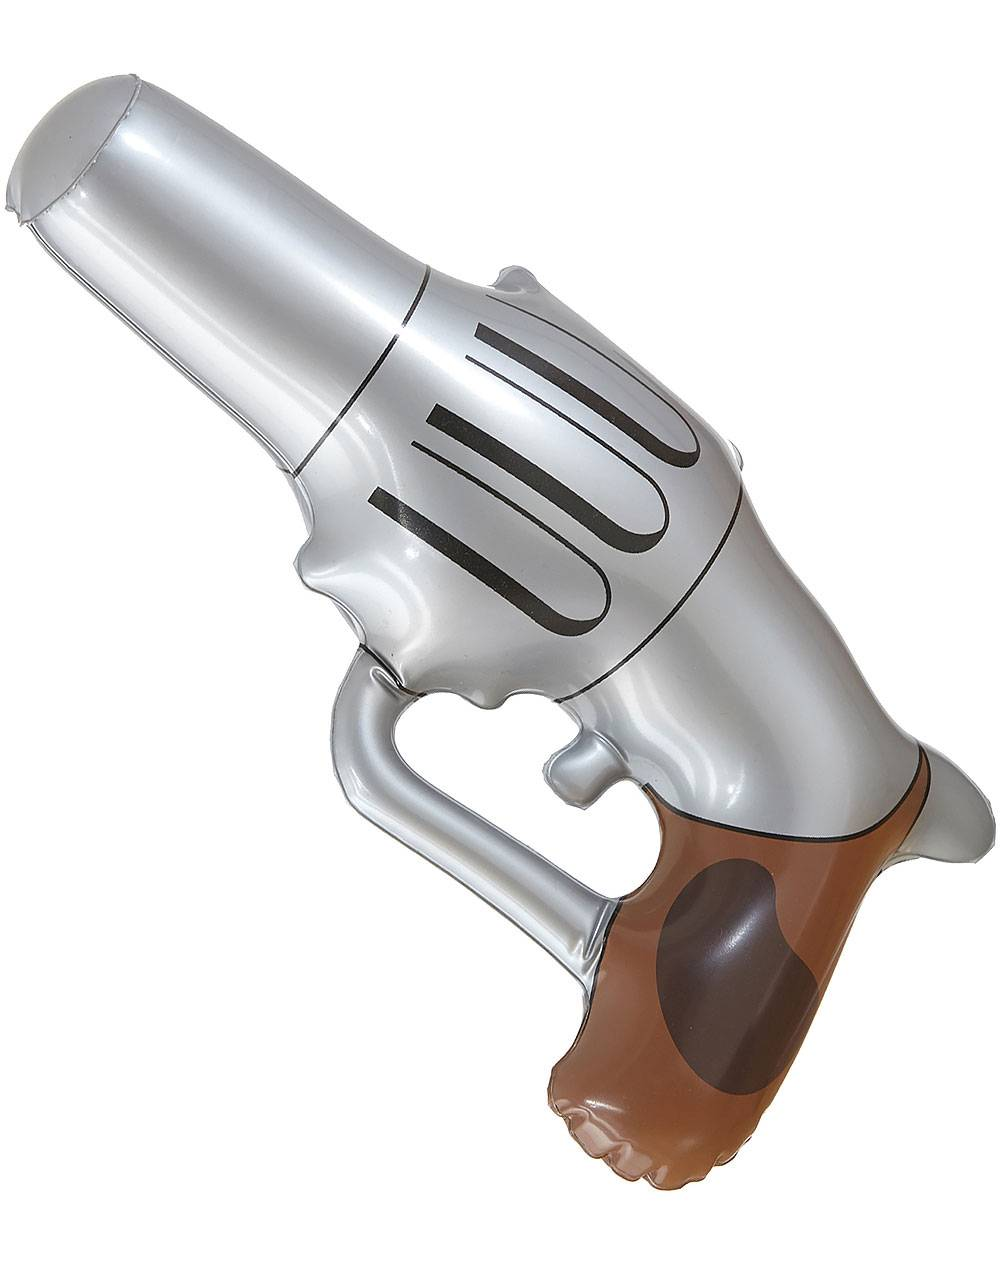 Oppblåsbar Cowboy Pistol - 29 cm